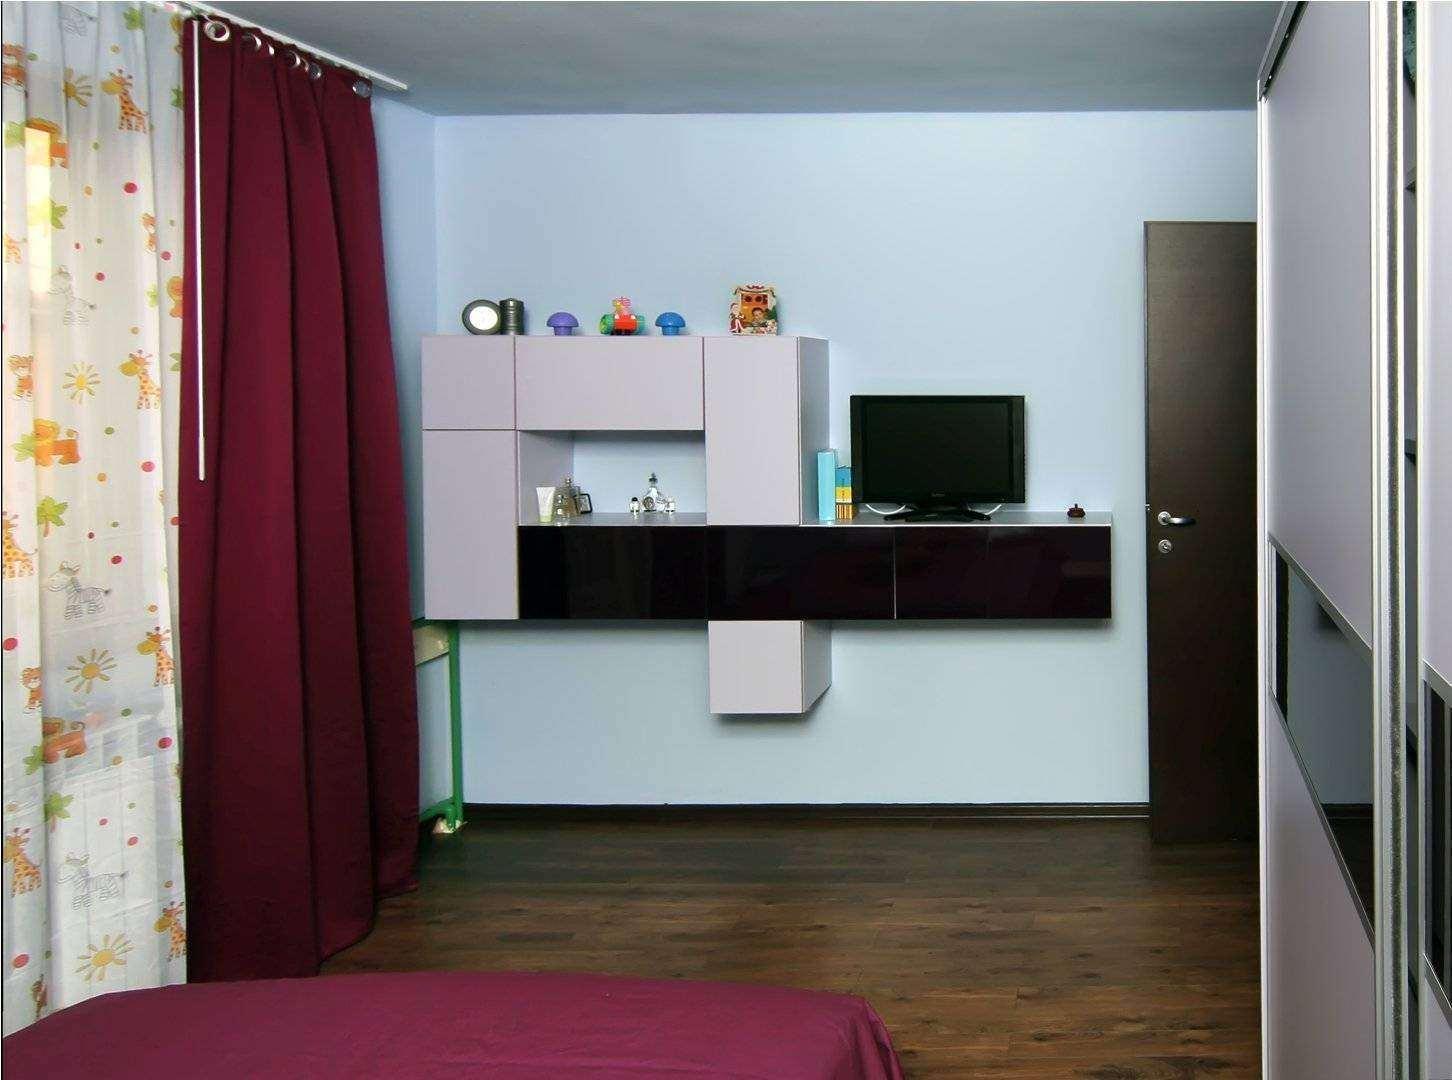 <a href=&quot;mobila dormitor moderna &quot;>comoda dormitor la comanda<img src='http://www.unican.ro/wp-content/themes/vita/img/dreapta.png' class='pull-right hidden-xs' style='margin-right:-10px;margin-top:-10px; max-height:41px'></a>